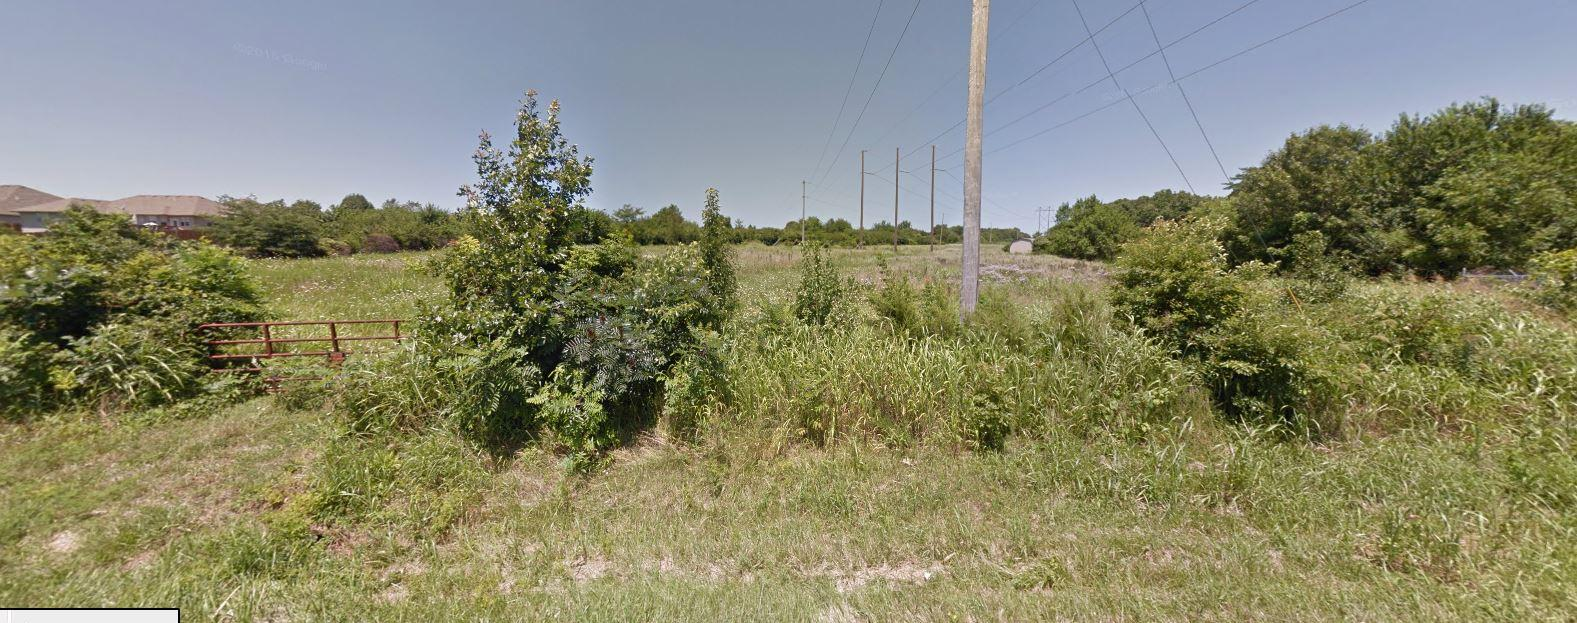 00 West Elm West Street Battlefield, MO 65619